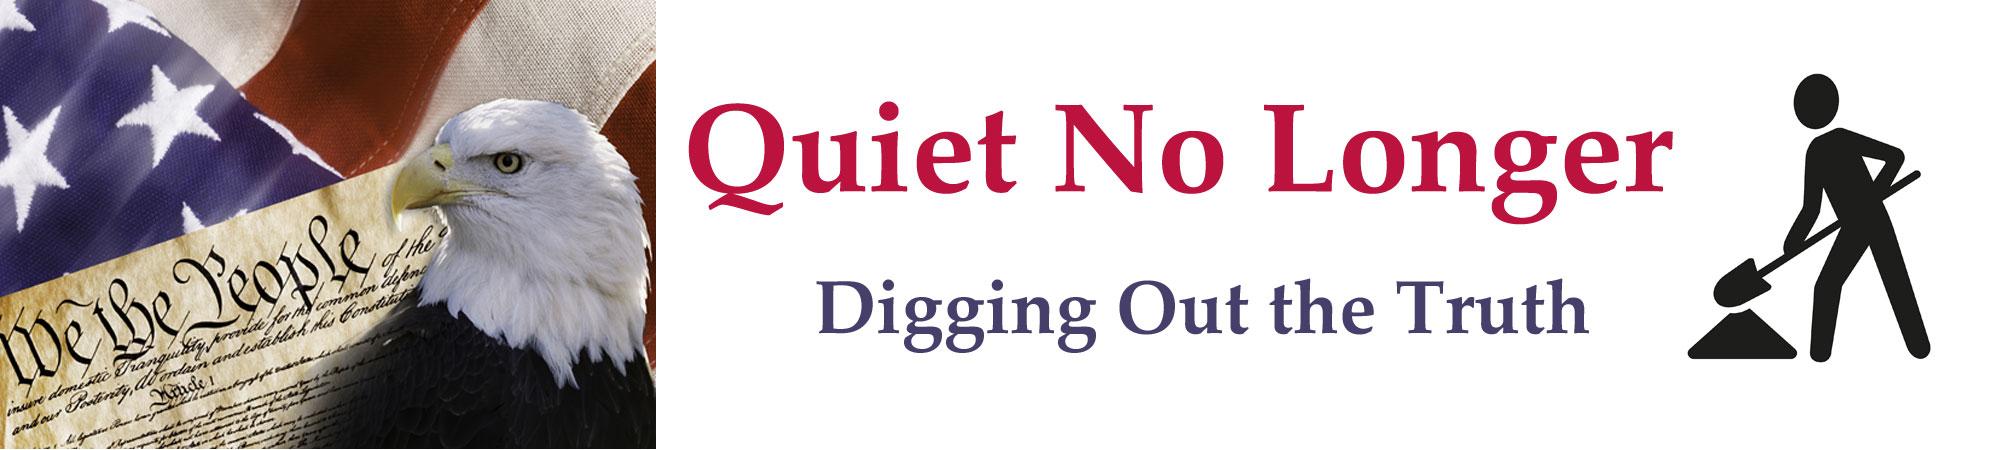 Quiet No Longer